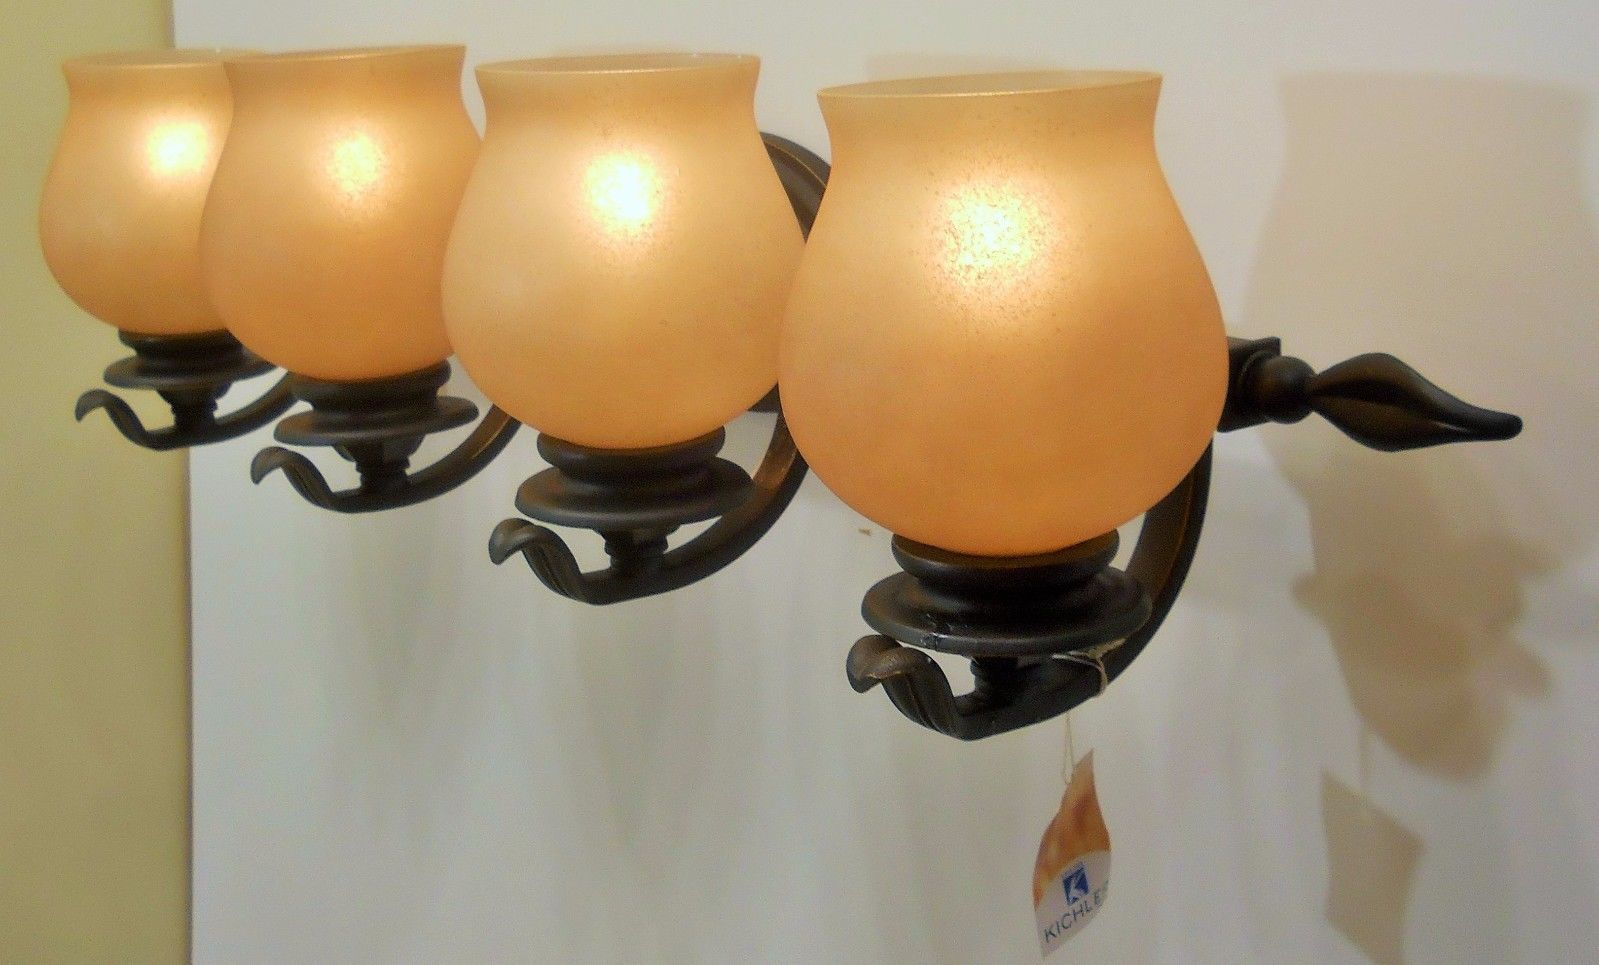 Exclusive Bronze Finish Wall Bathroom Bath Vanity Light Fixture Scroll Work